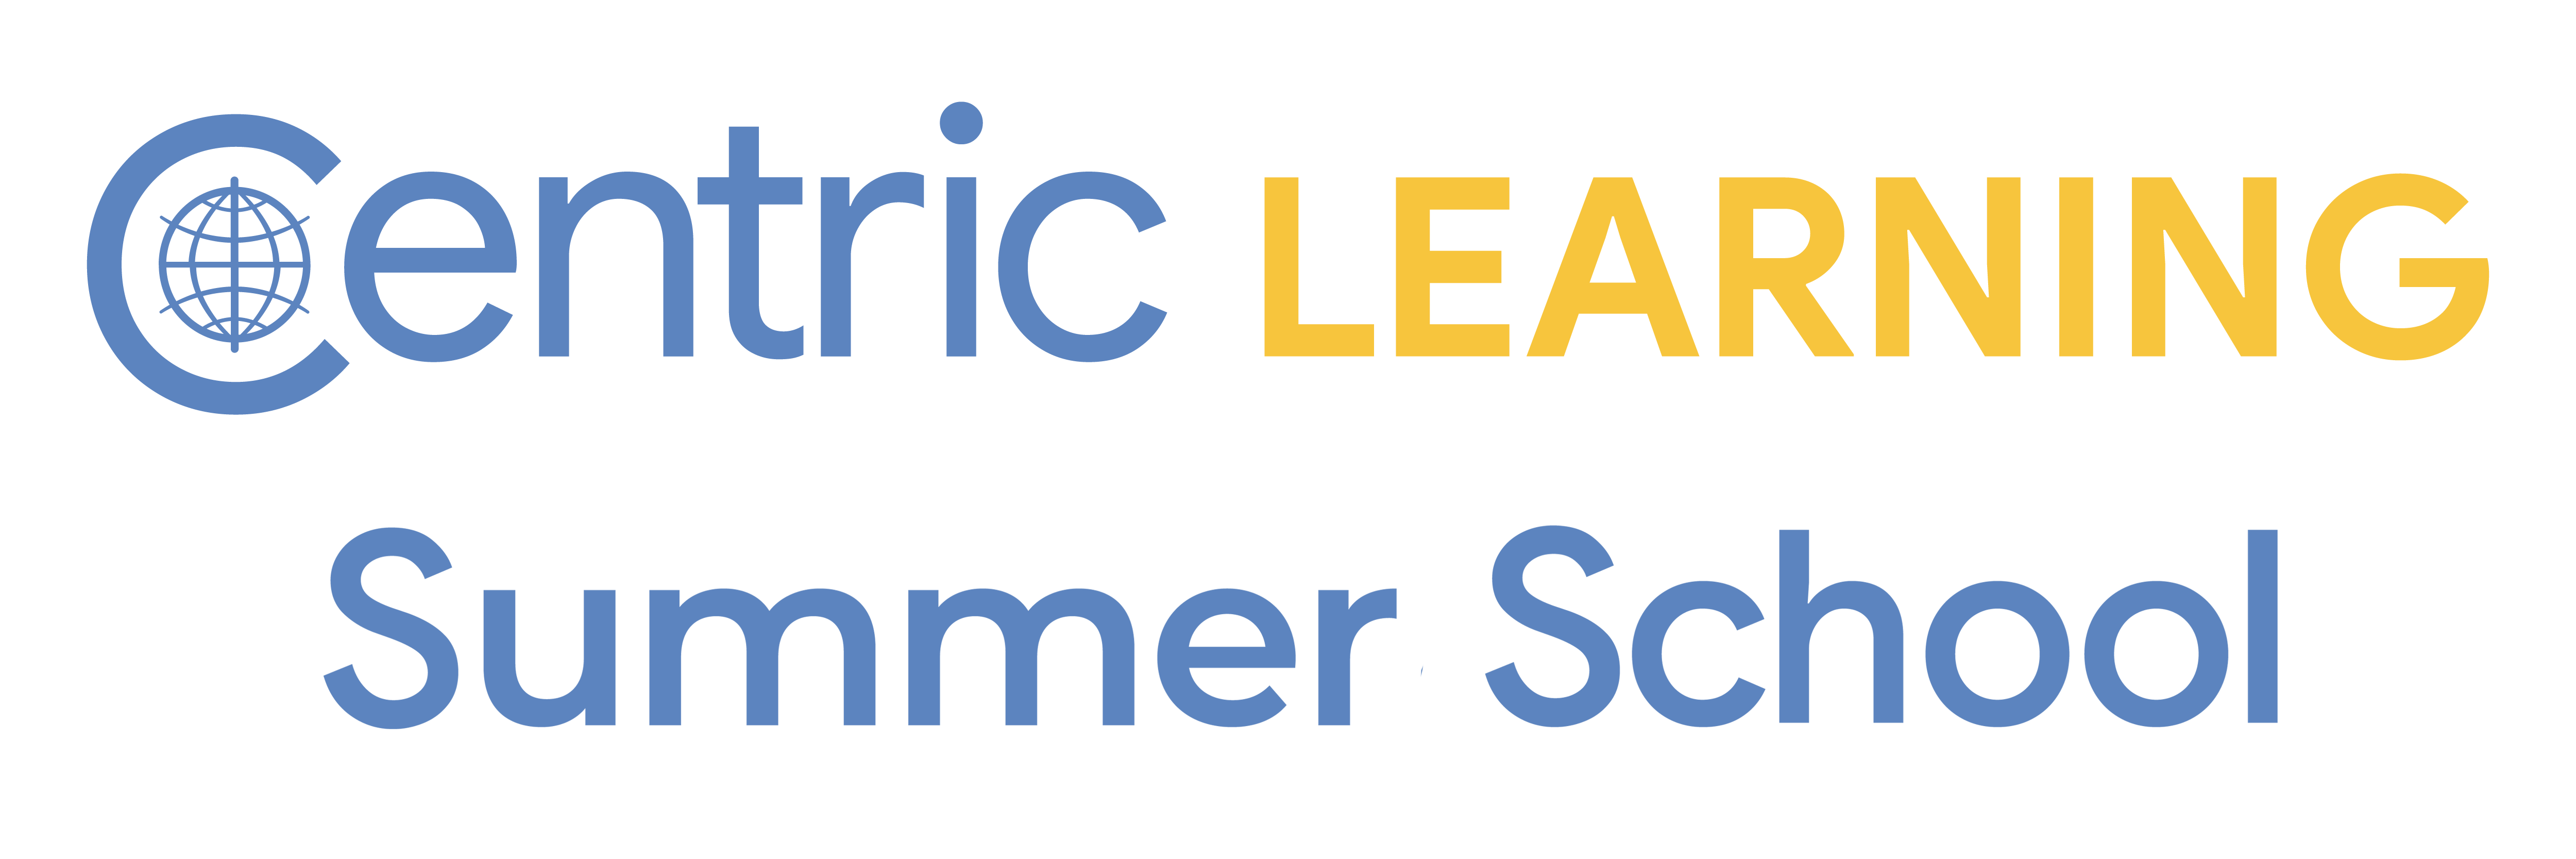 CentricLearning_Summer-School-Logo-trans